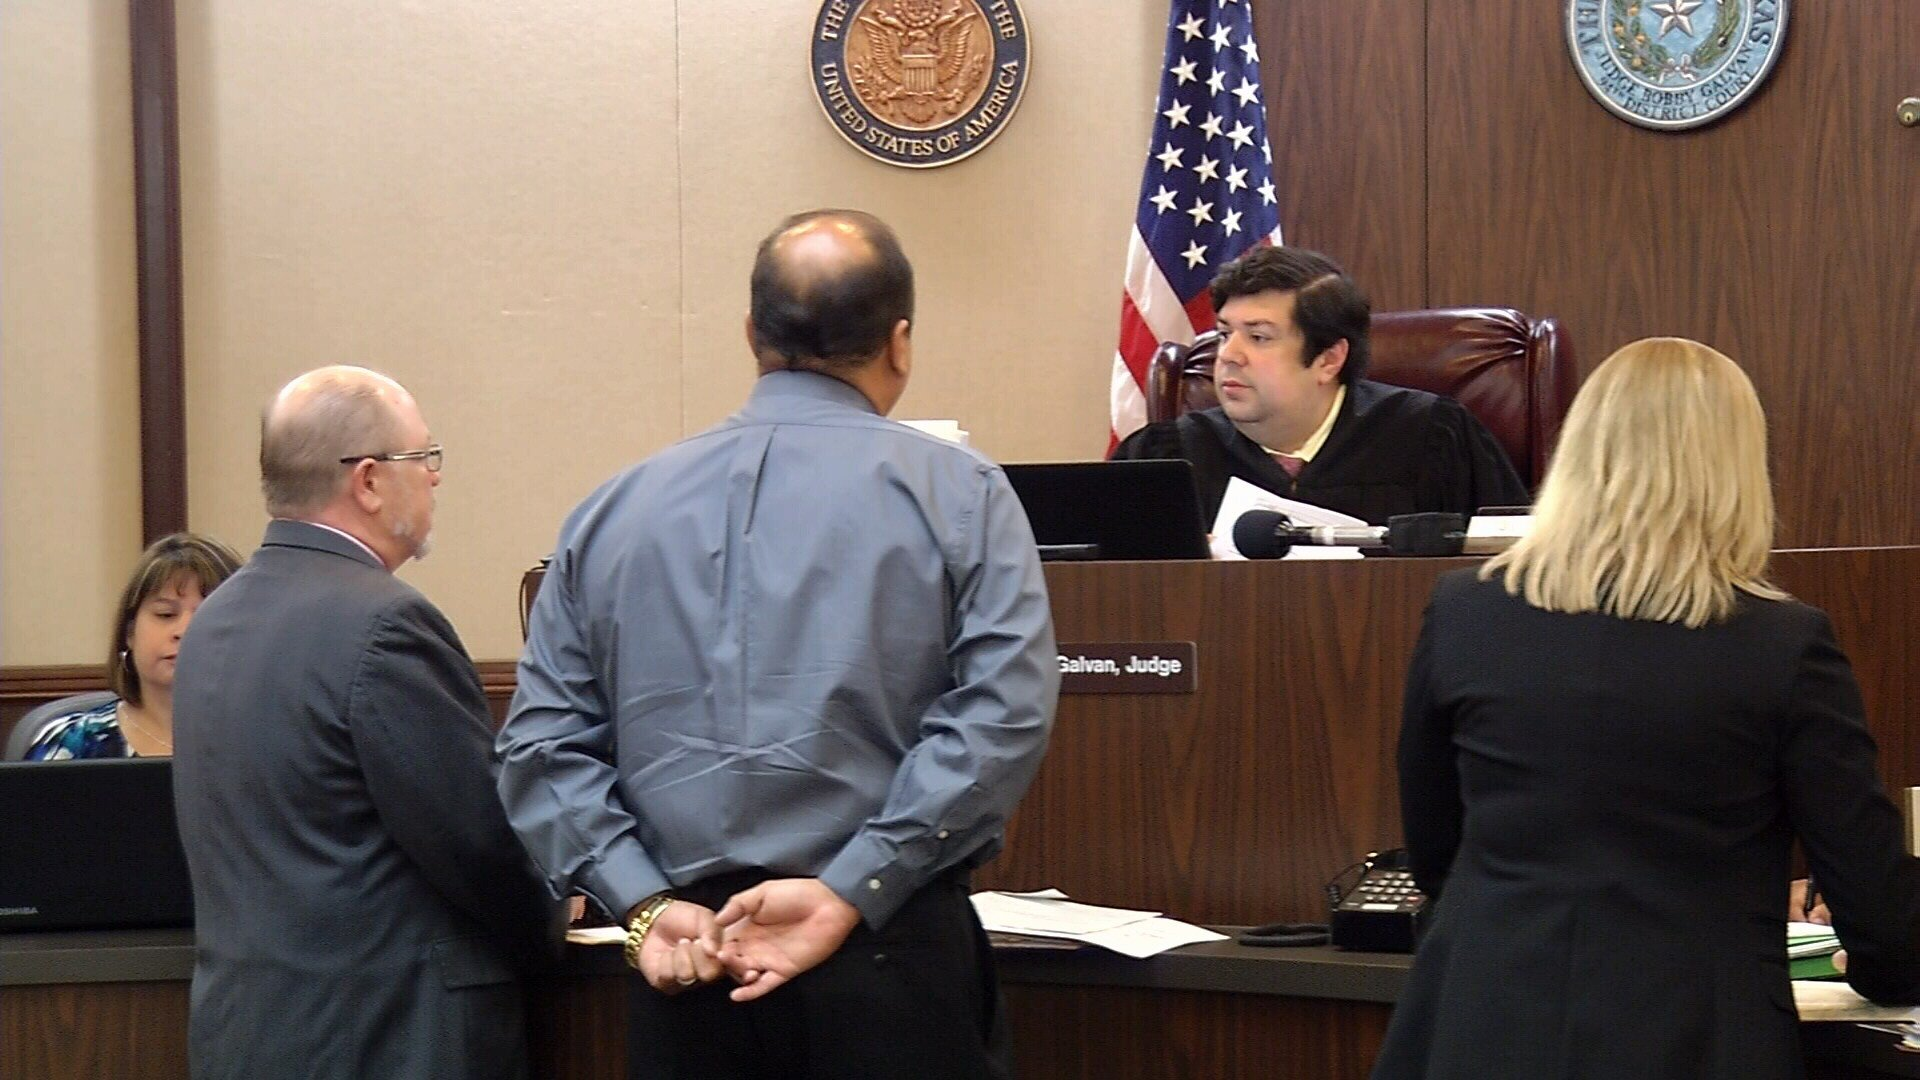 Judge Bobby Galvan denied Hinojosa's request Friday morning.